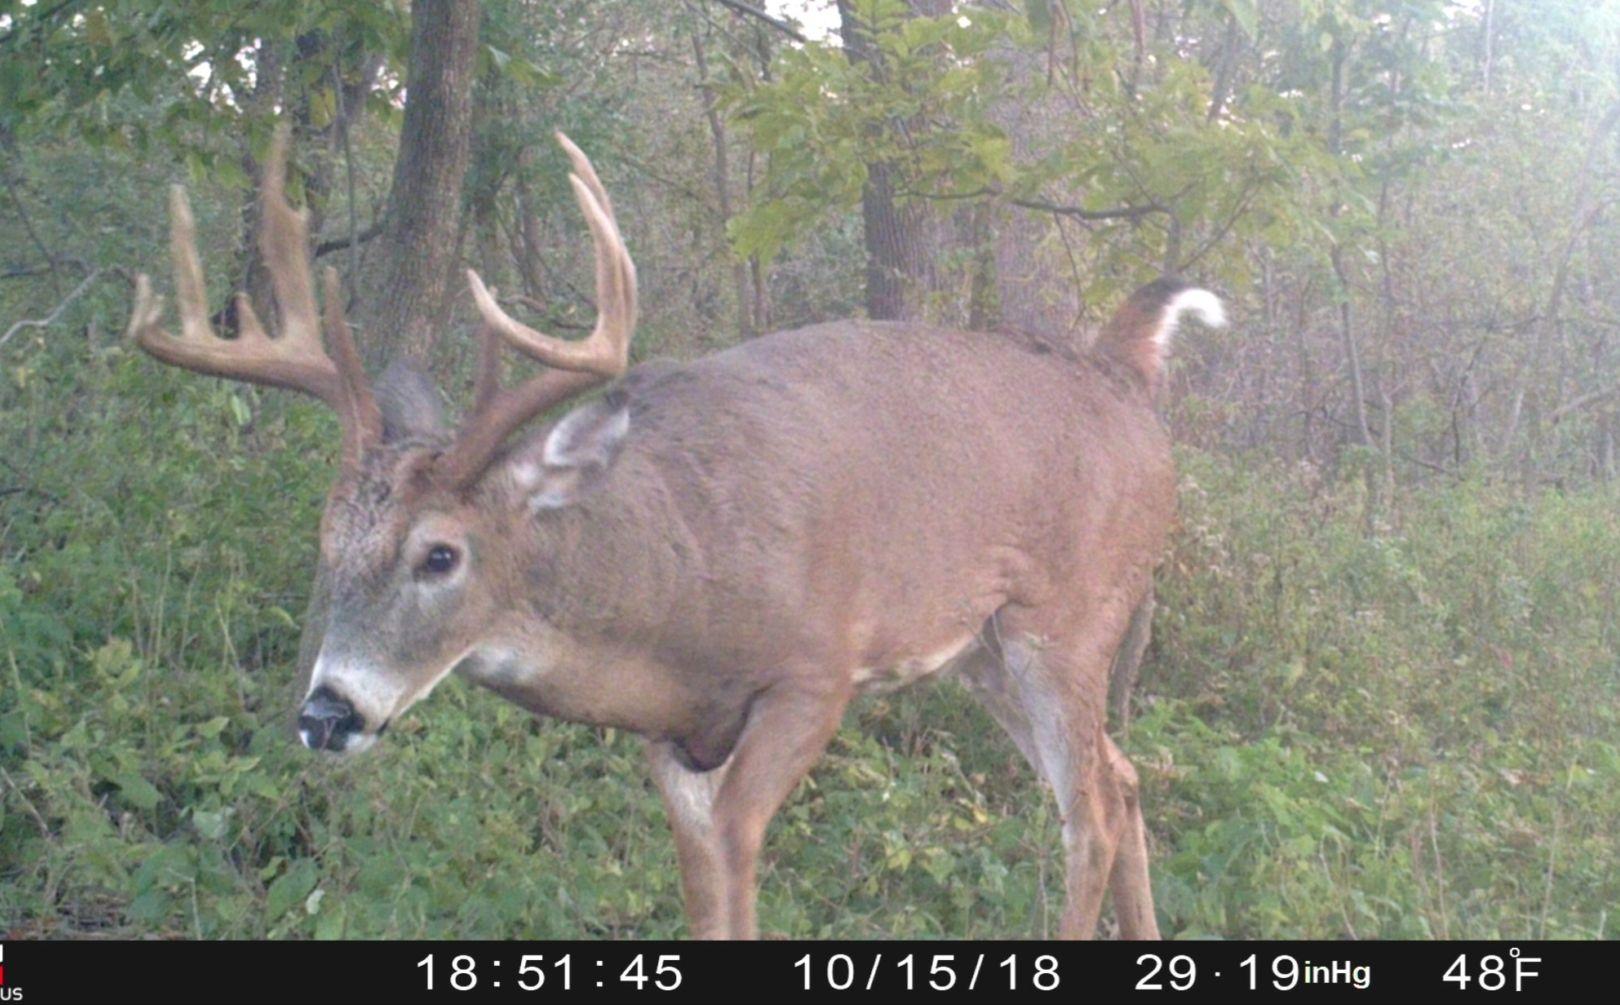 When Will The Whitetail Rut Begin   Whitetail Habitat Solutions regarding 2020 Illinois Deer Rut Activity